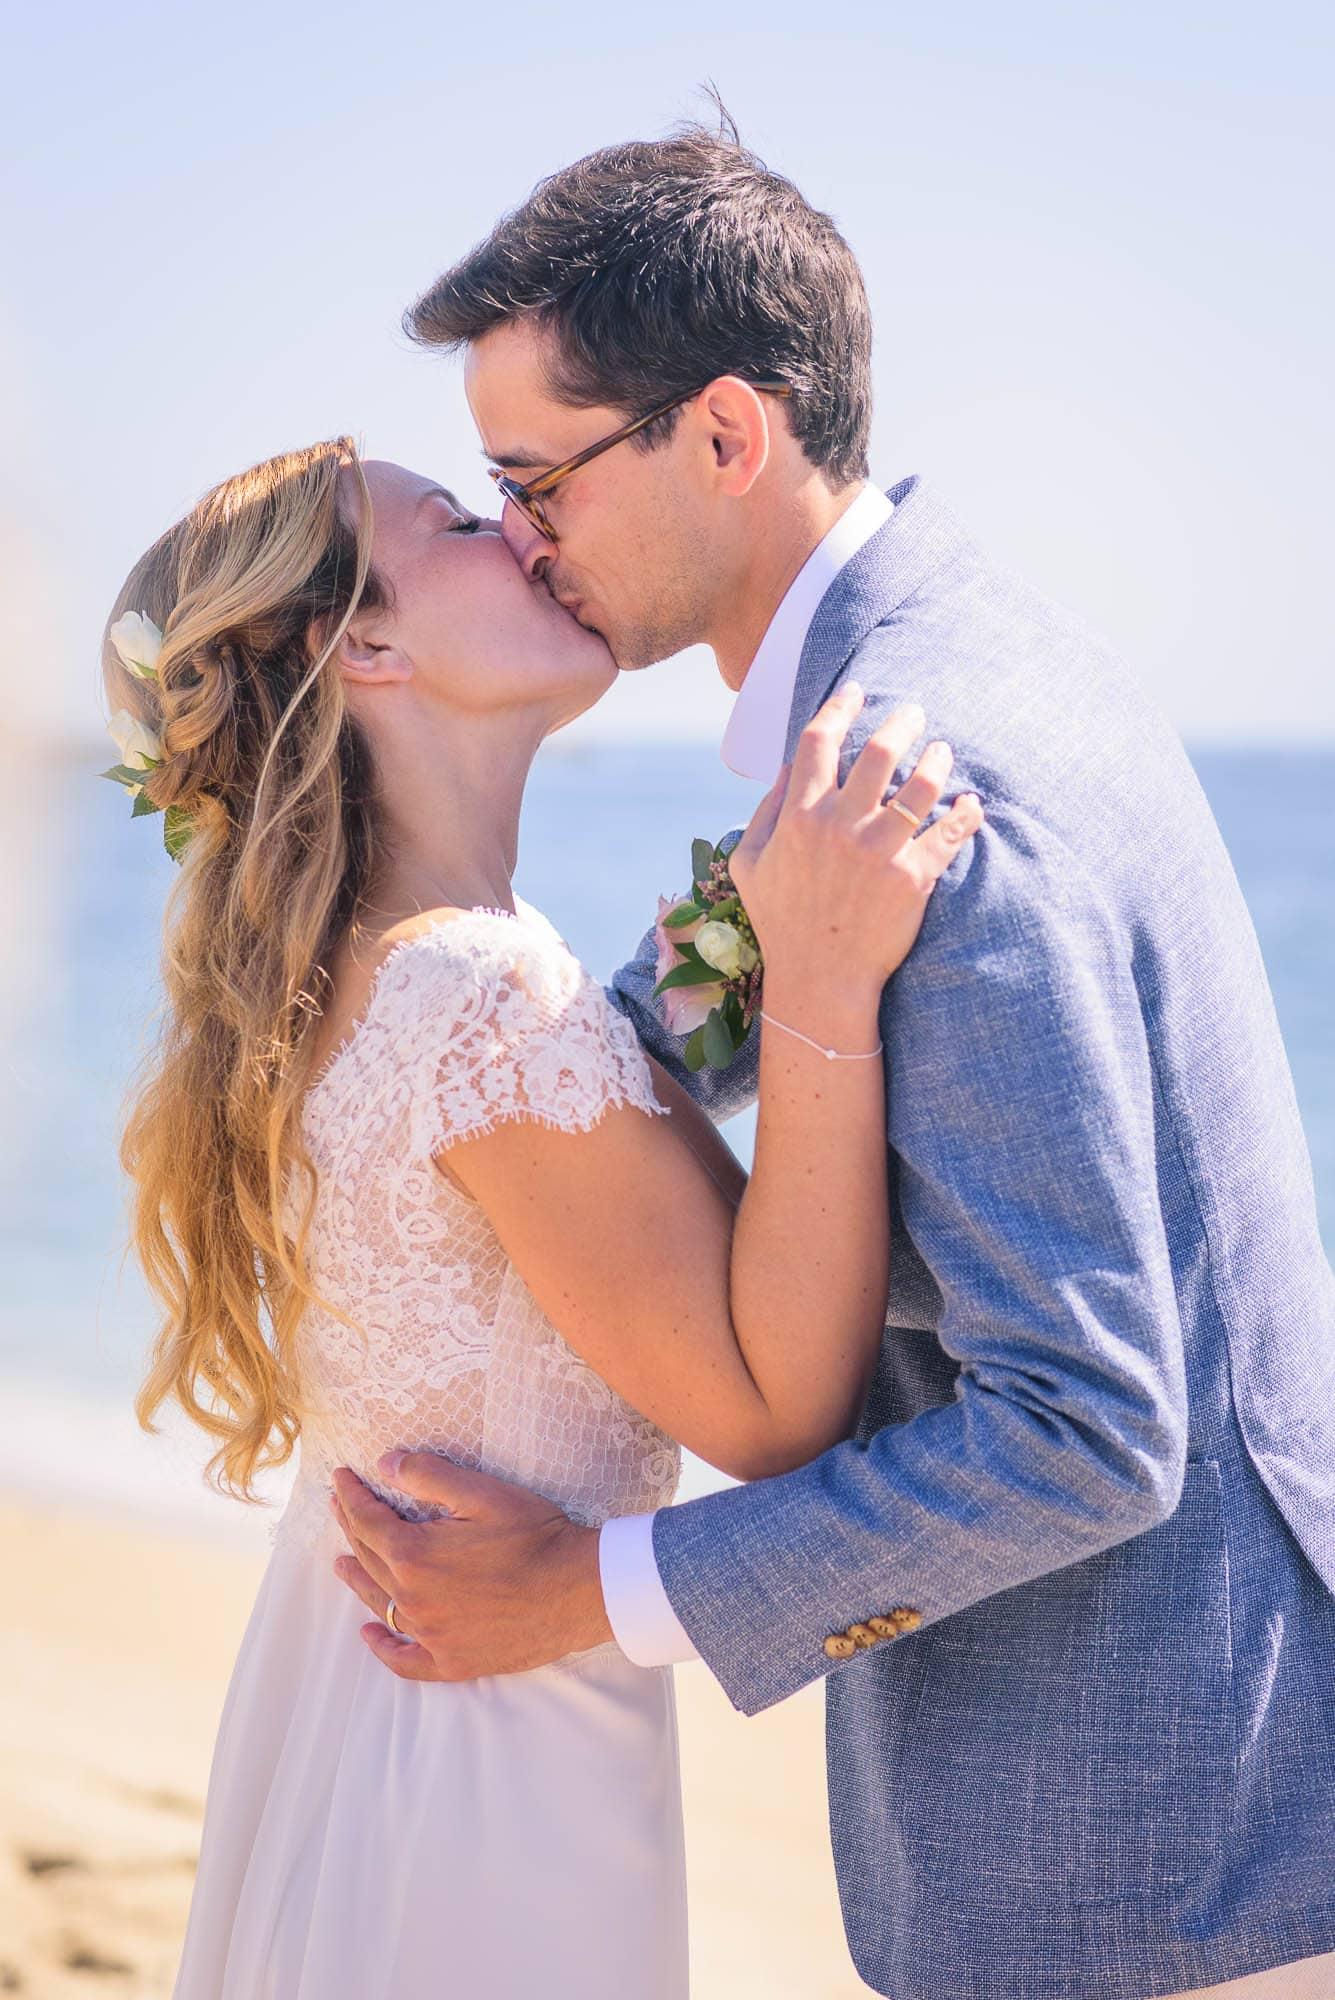 028_Alan_and_Heidi_Wedding_Verena_Andreas